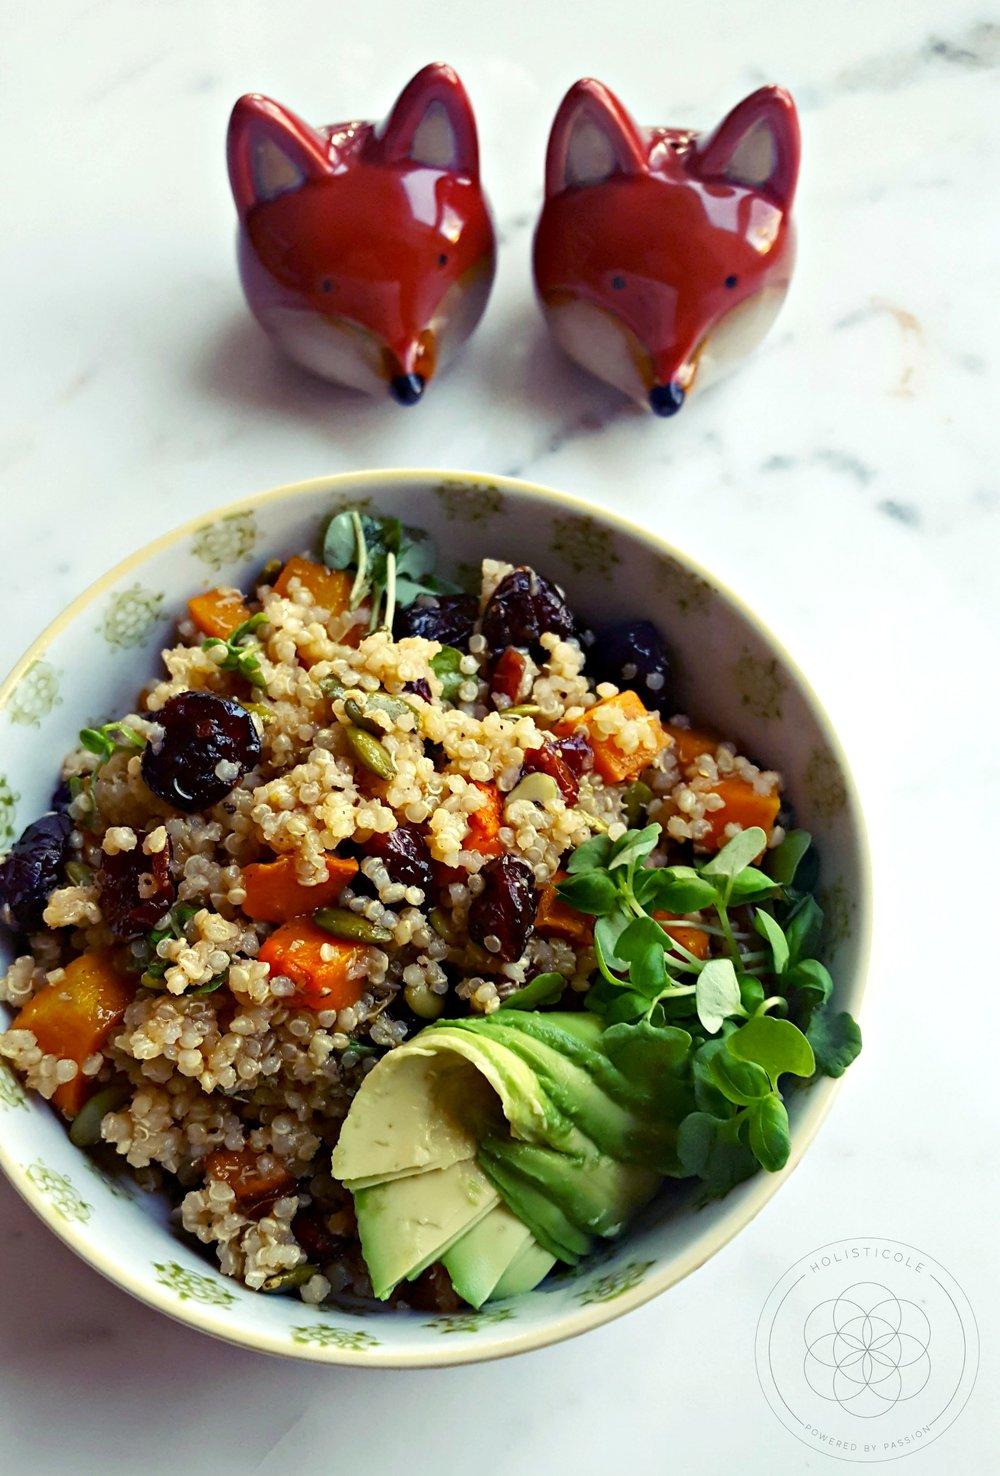 Quinoa Cranberry & Butternut Squash Salad - Holisticole